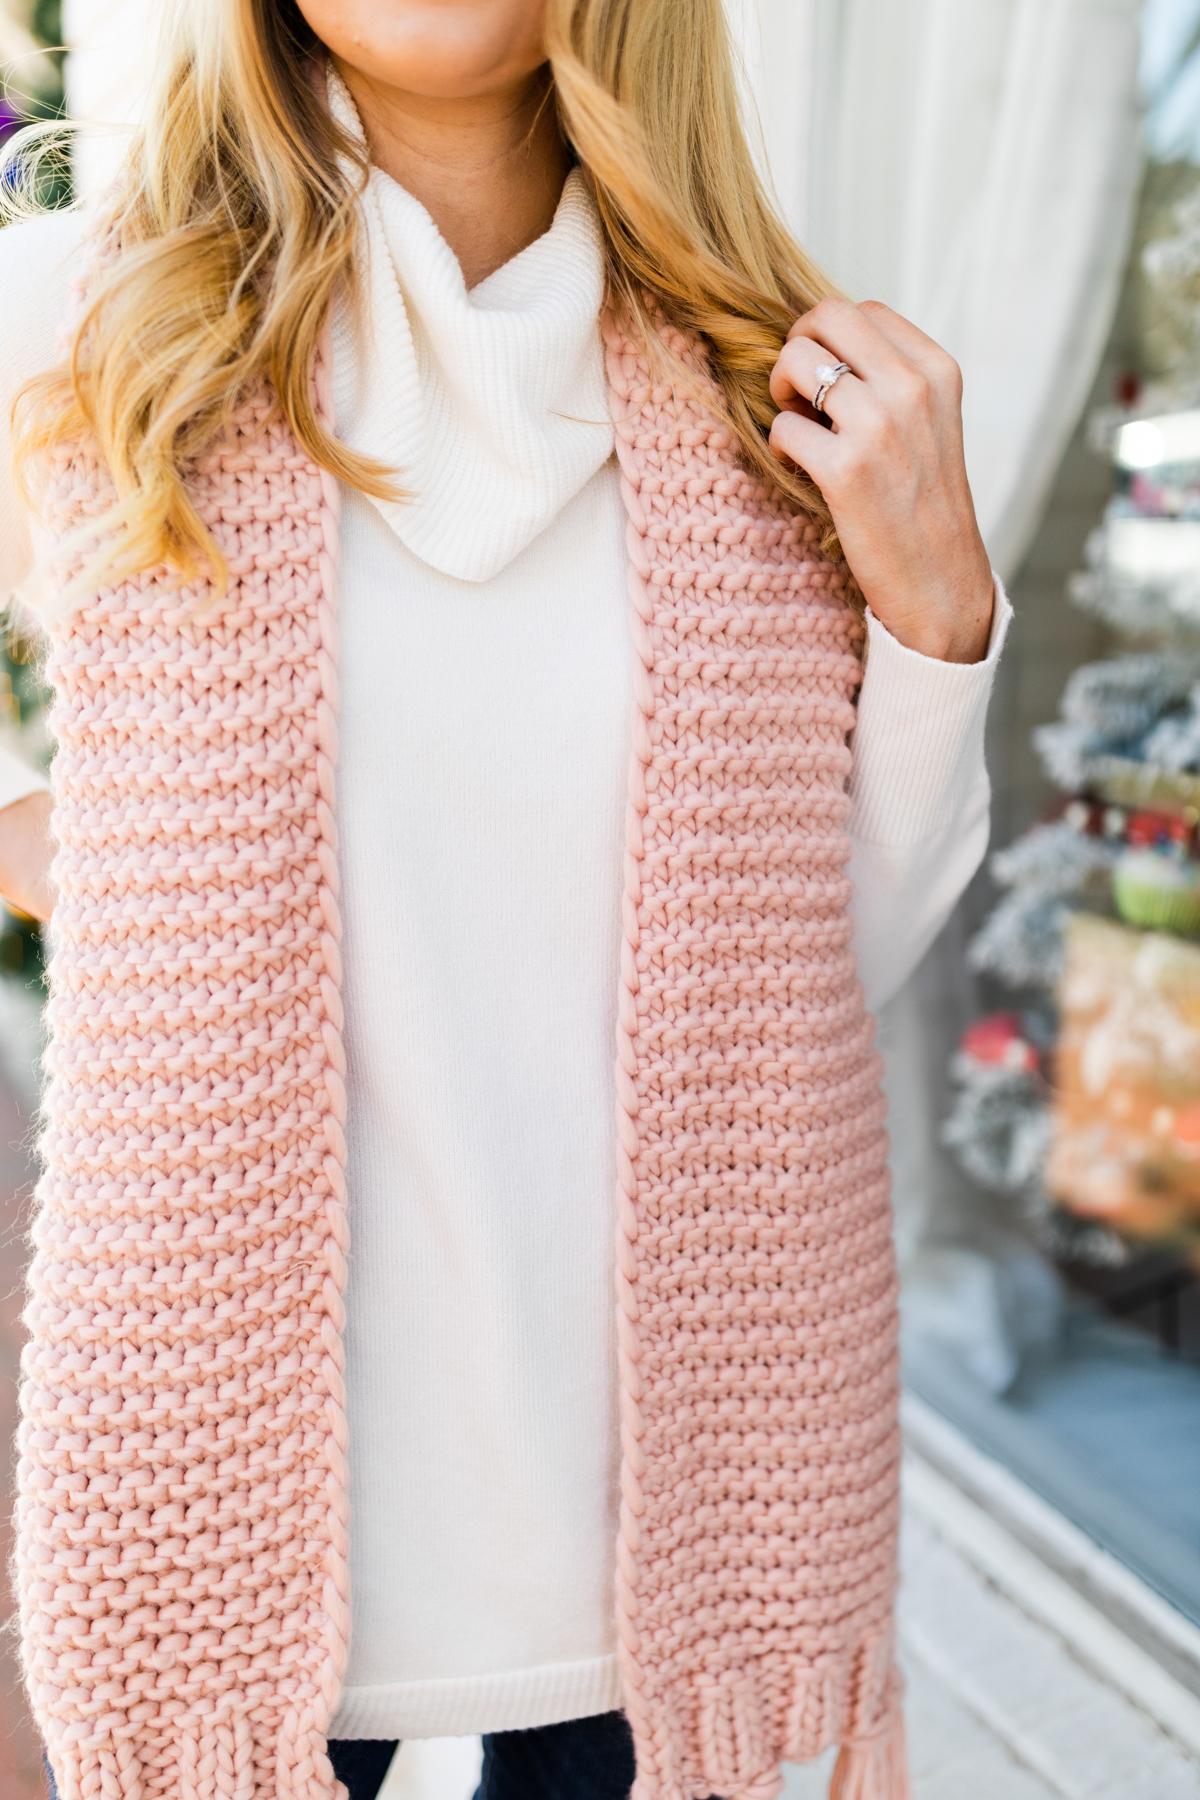 chunkyskinscarf